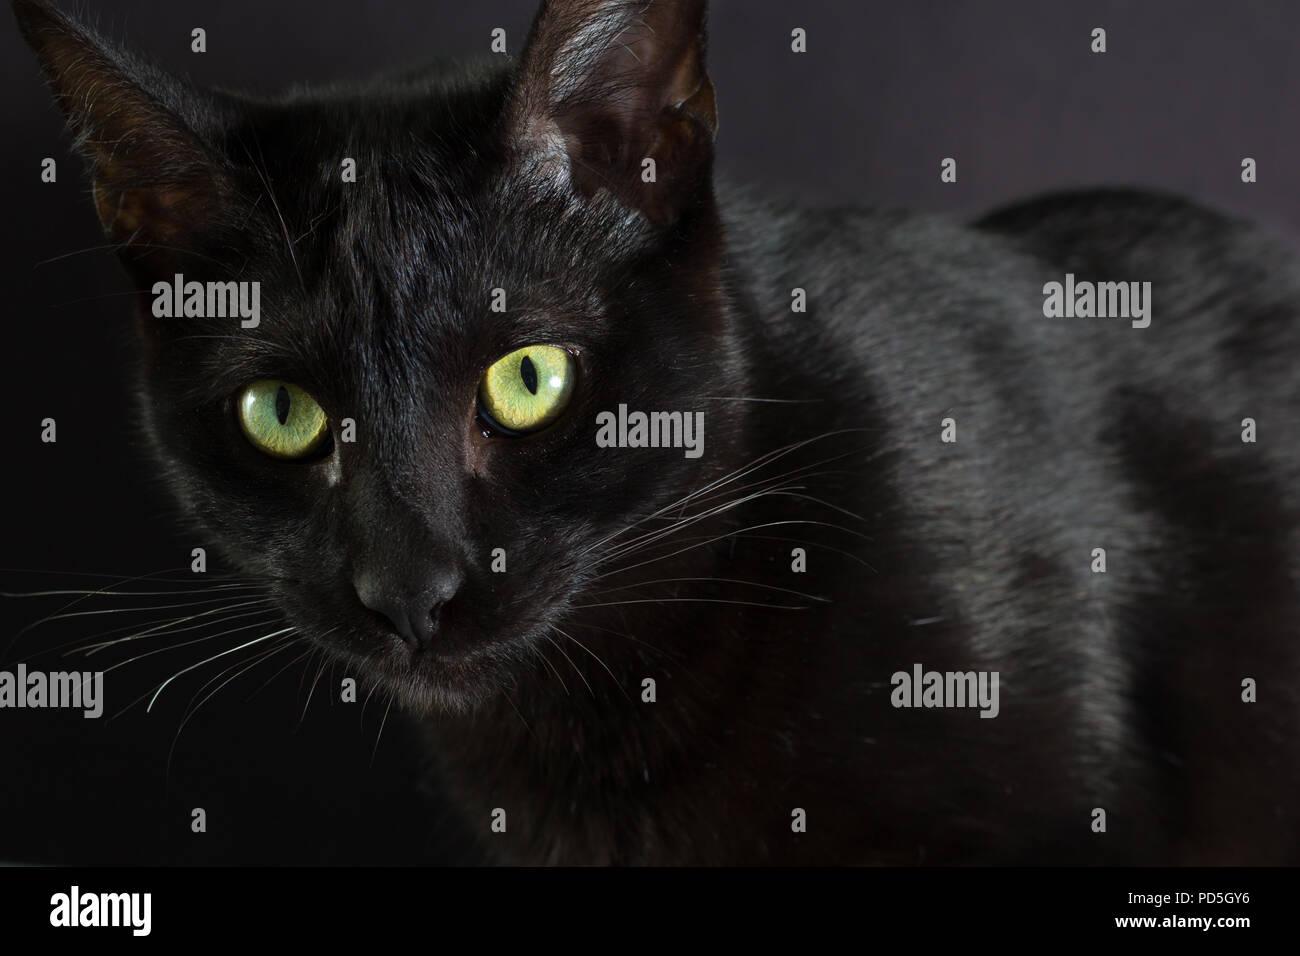 Halloween concept, Black cat. Portrait of Domestic feline in dark shadows - Stock Image